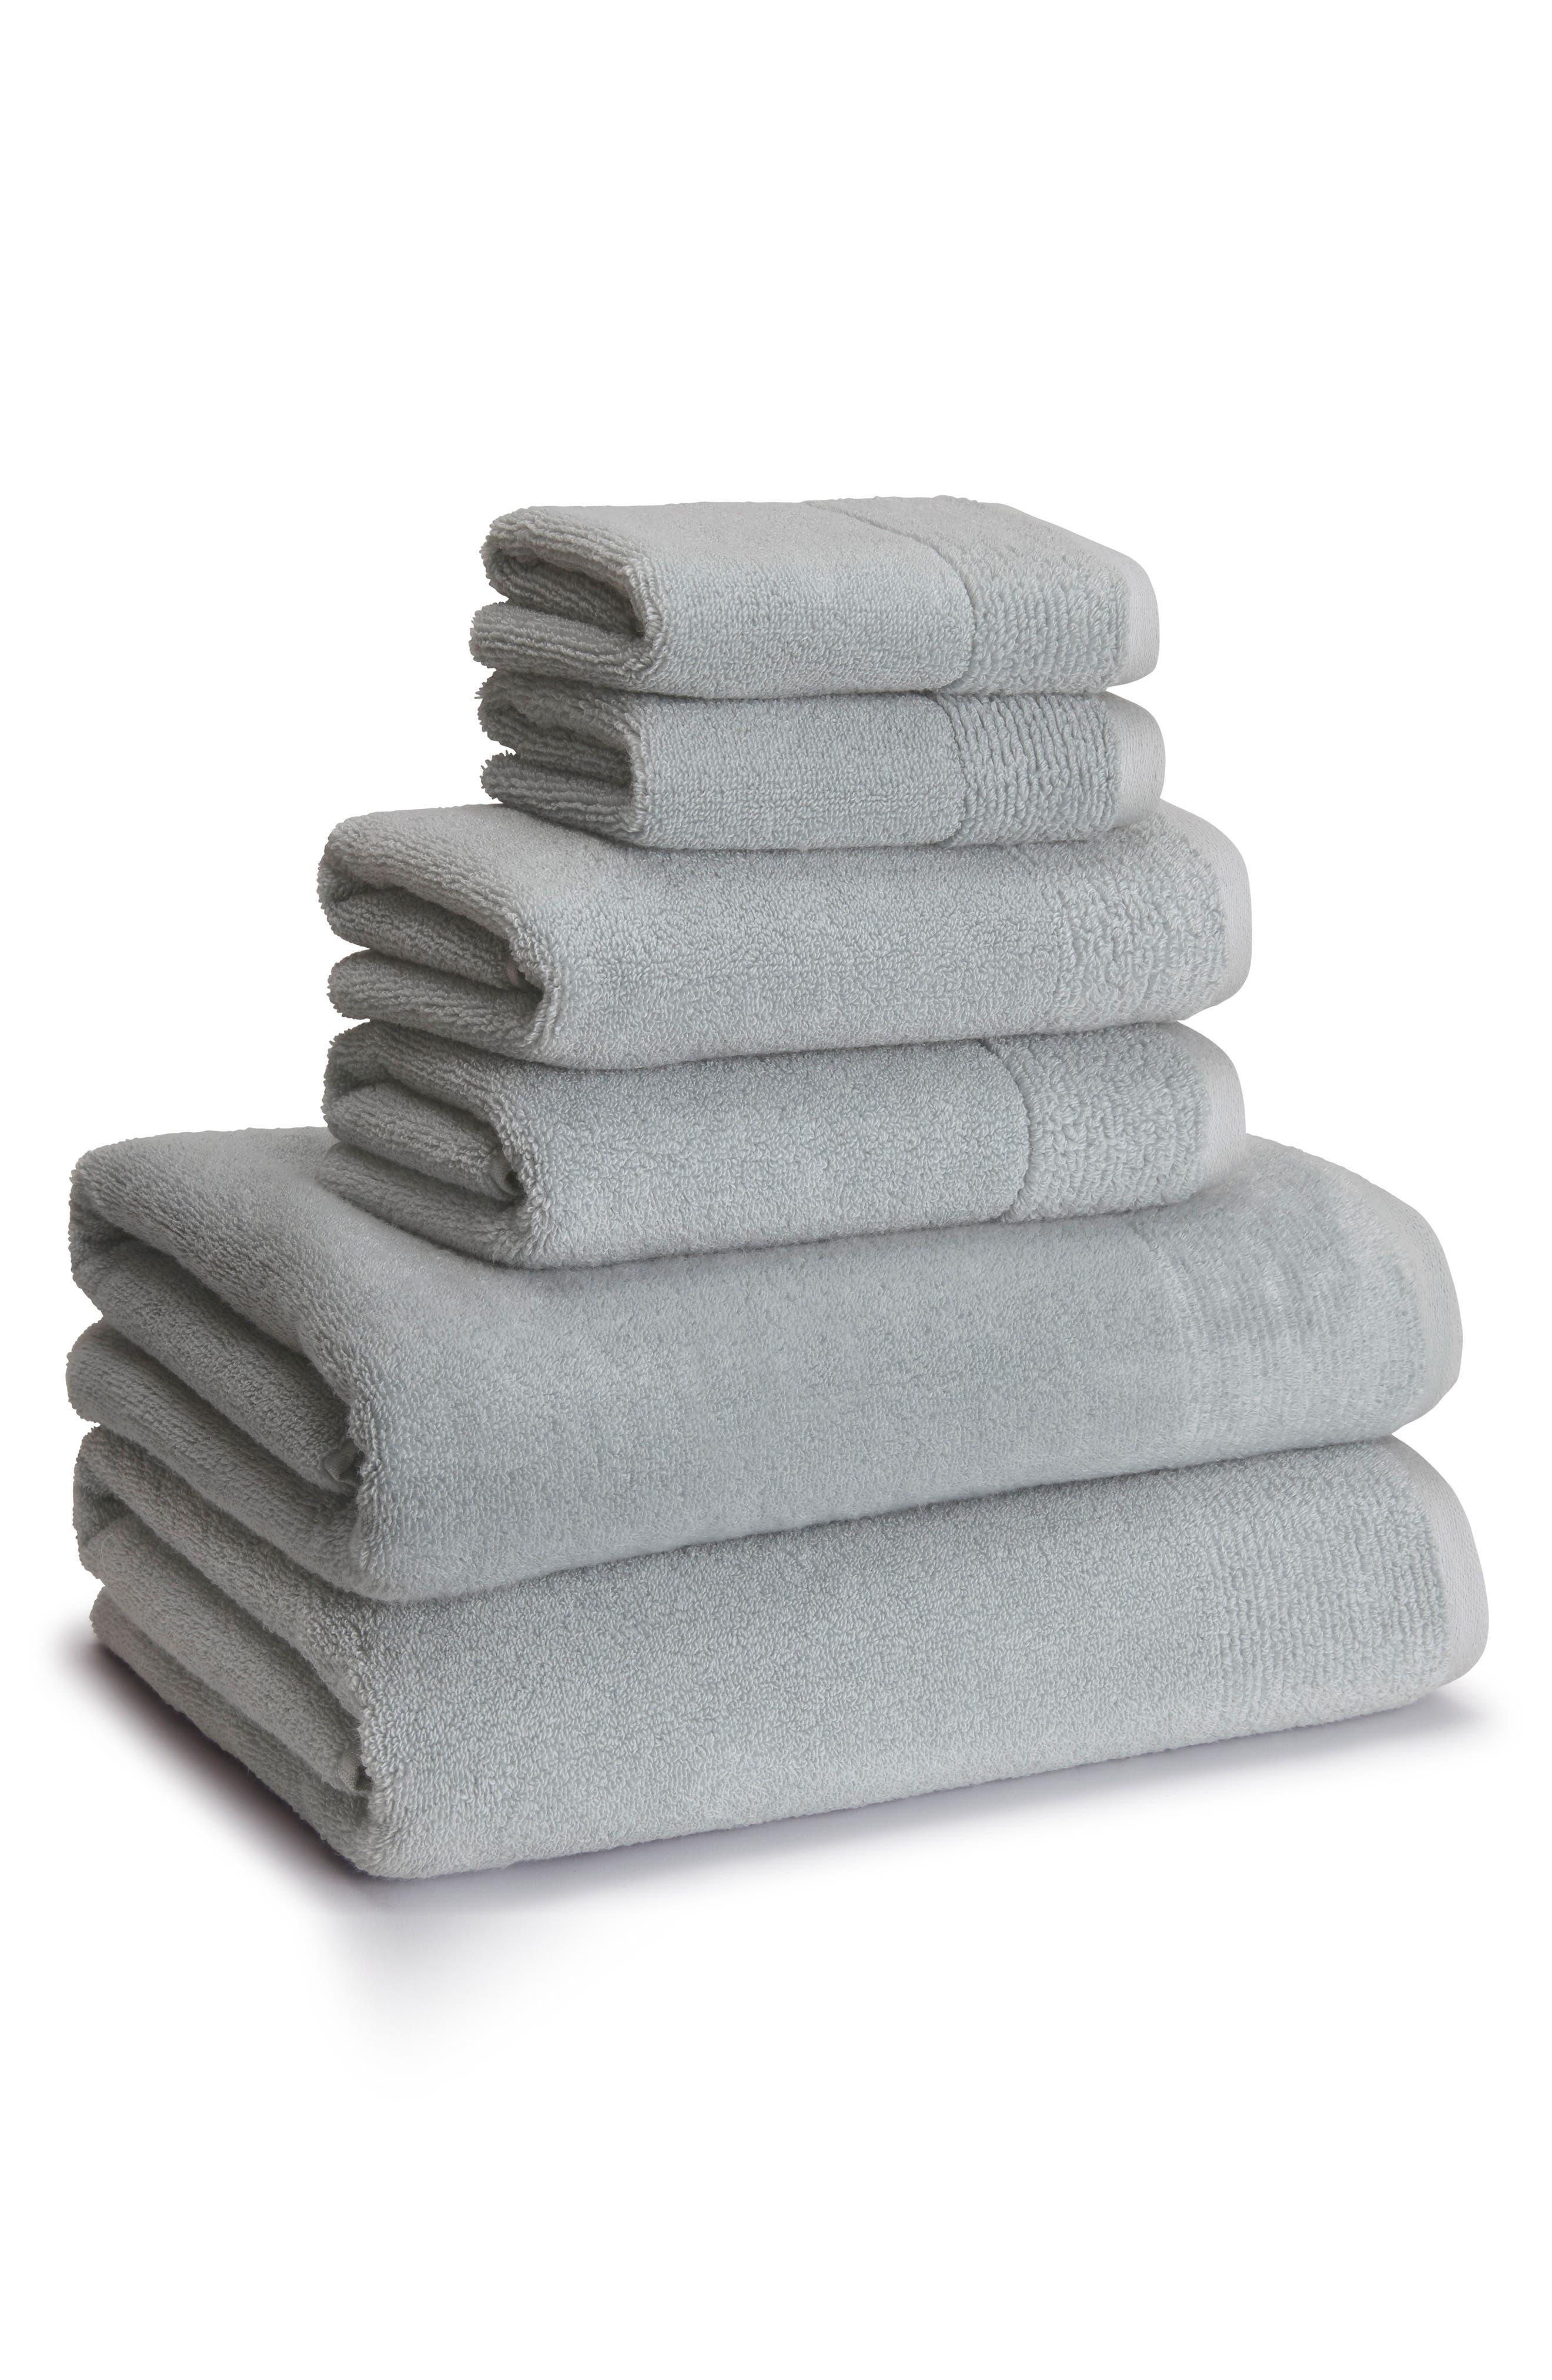 Alternate Image 1 Selected - KASSATEX Kyoto Hand Towel